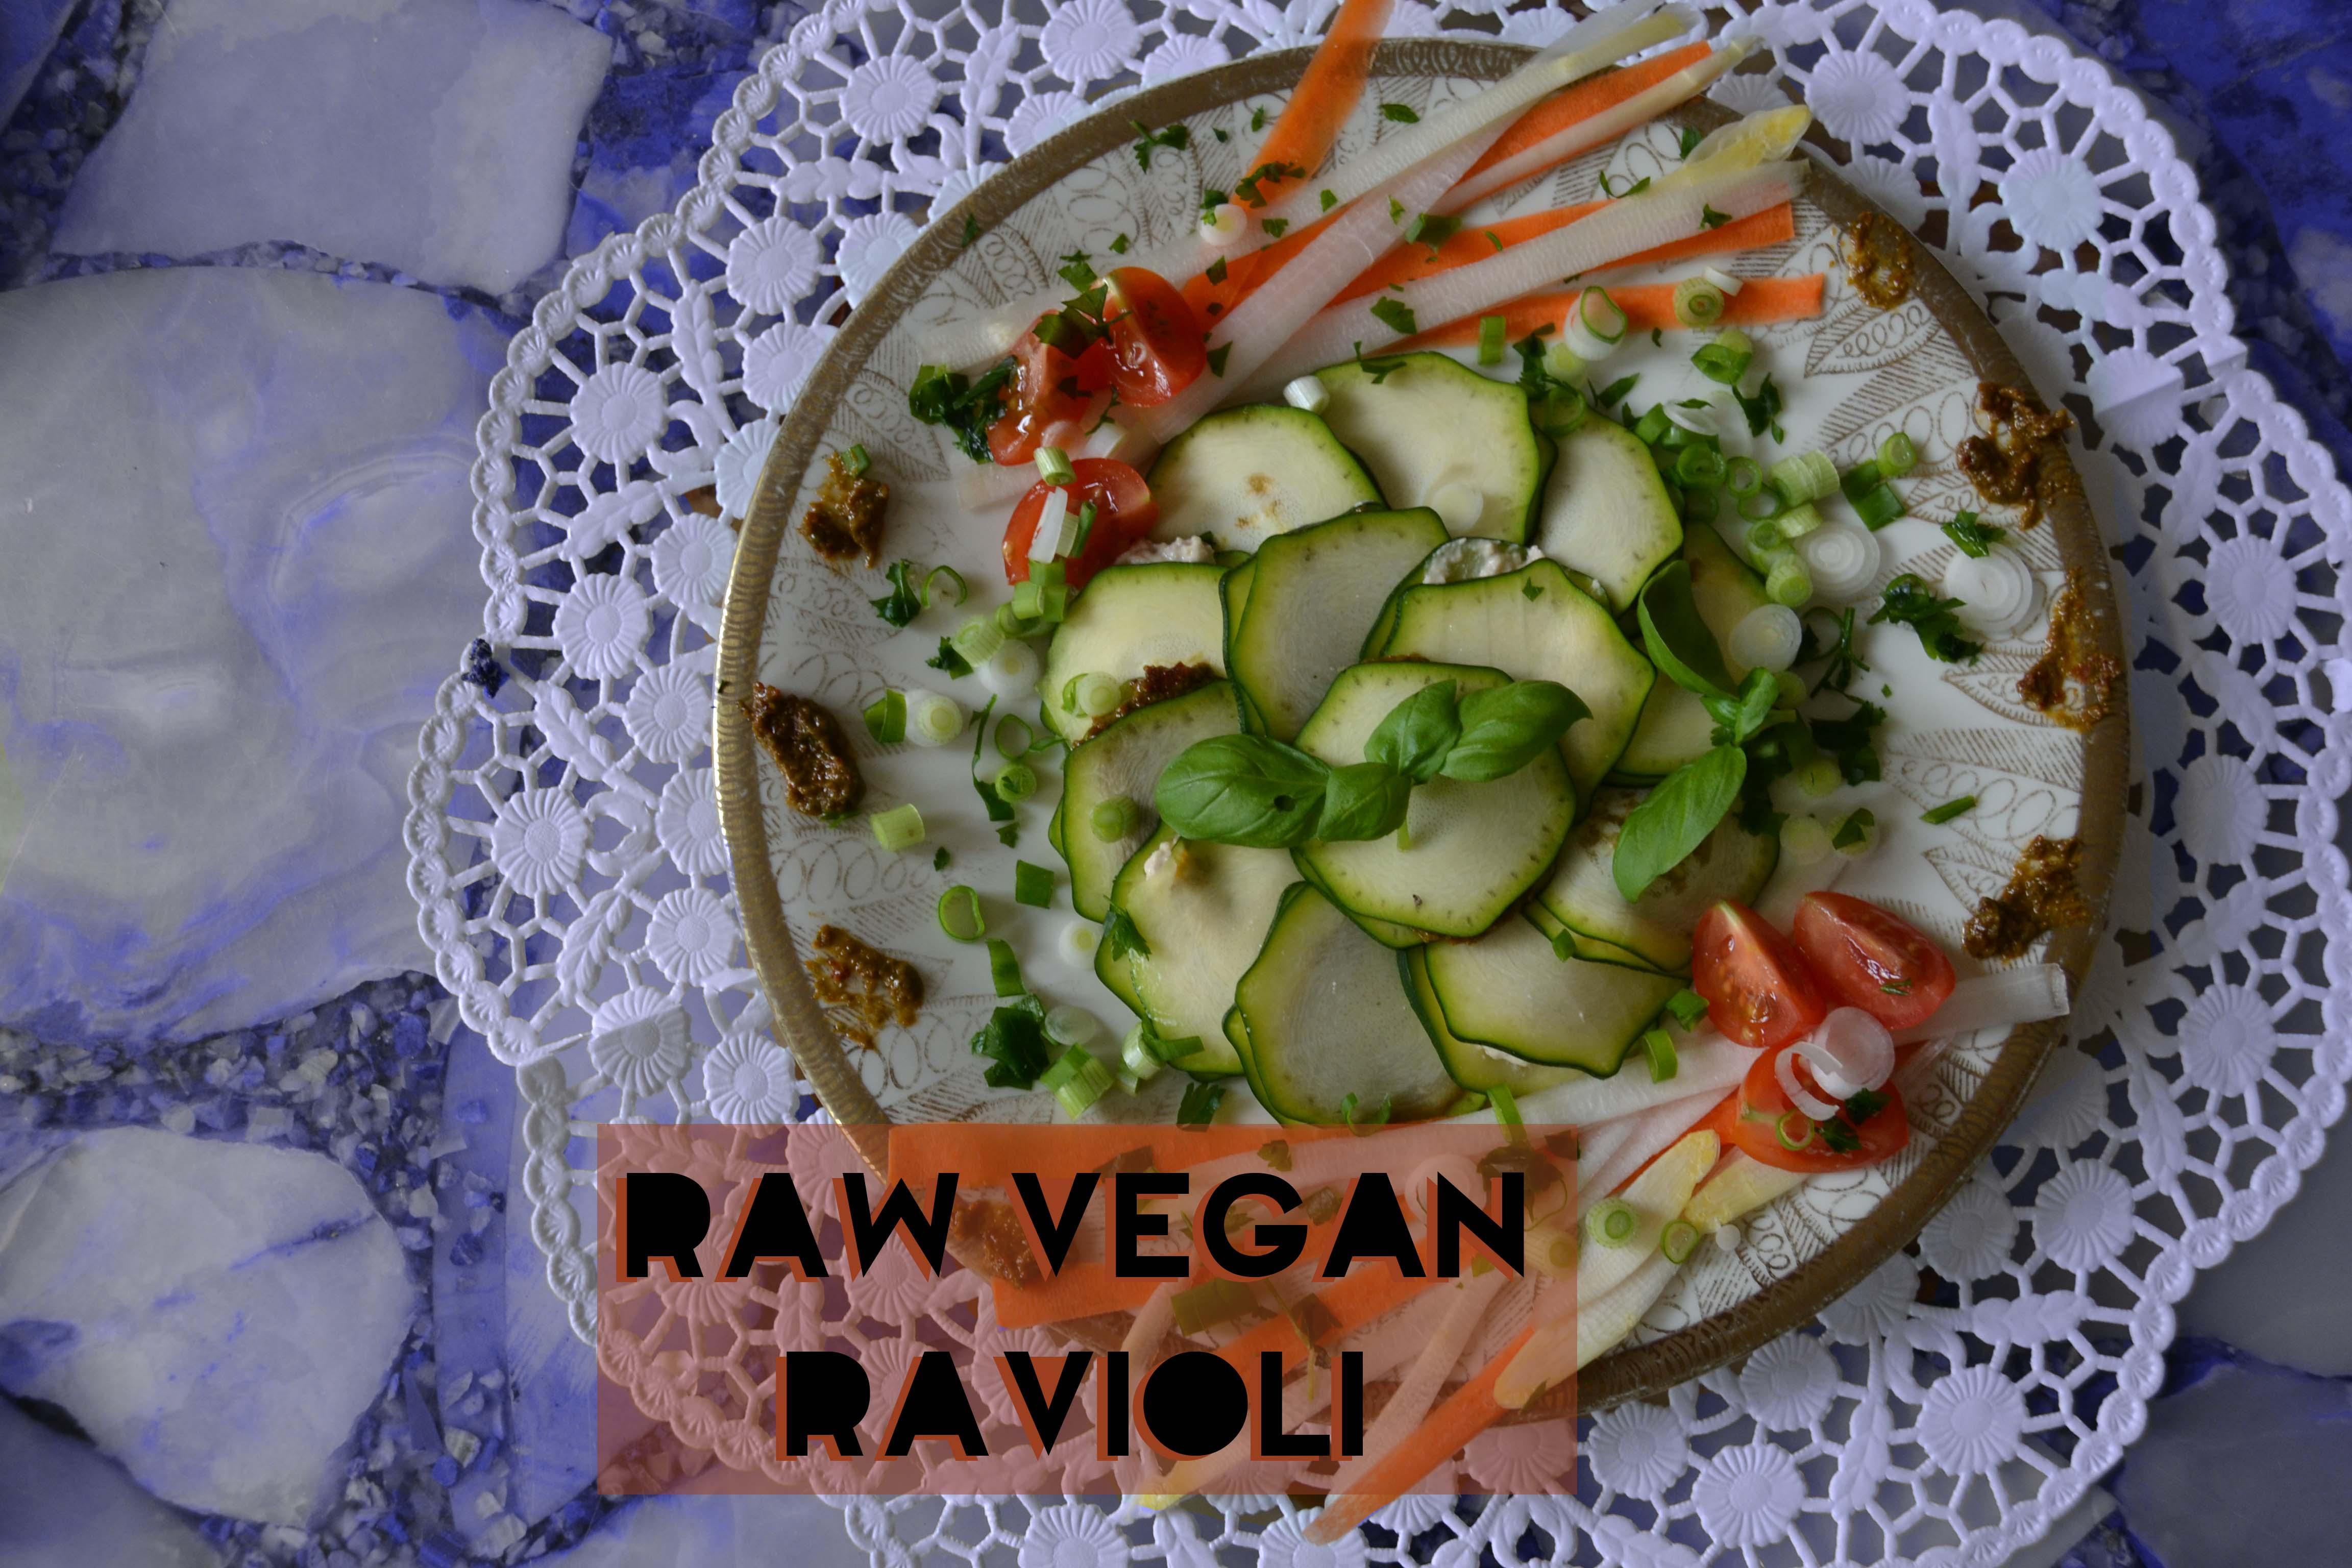 Picture of RAW-ioli / Raw Vegan Ravioli